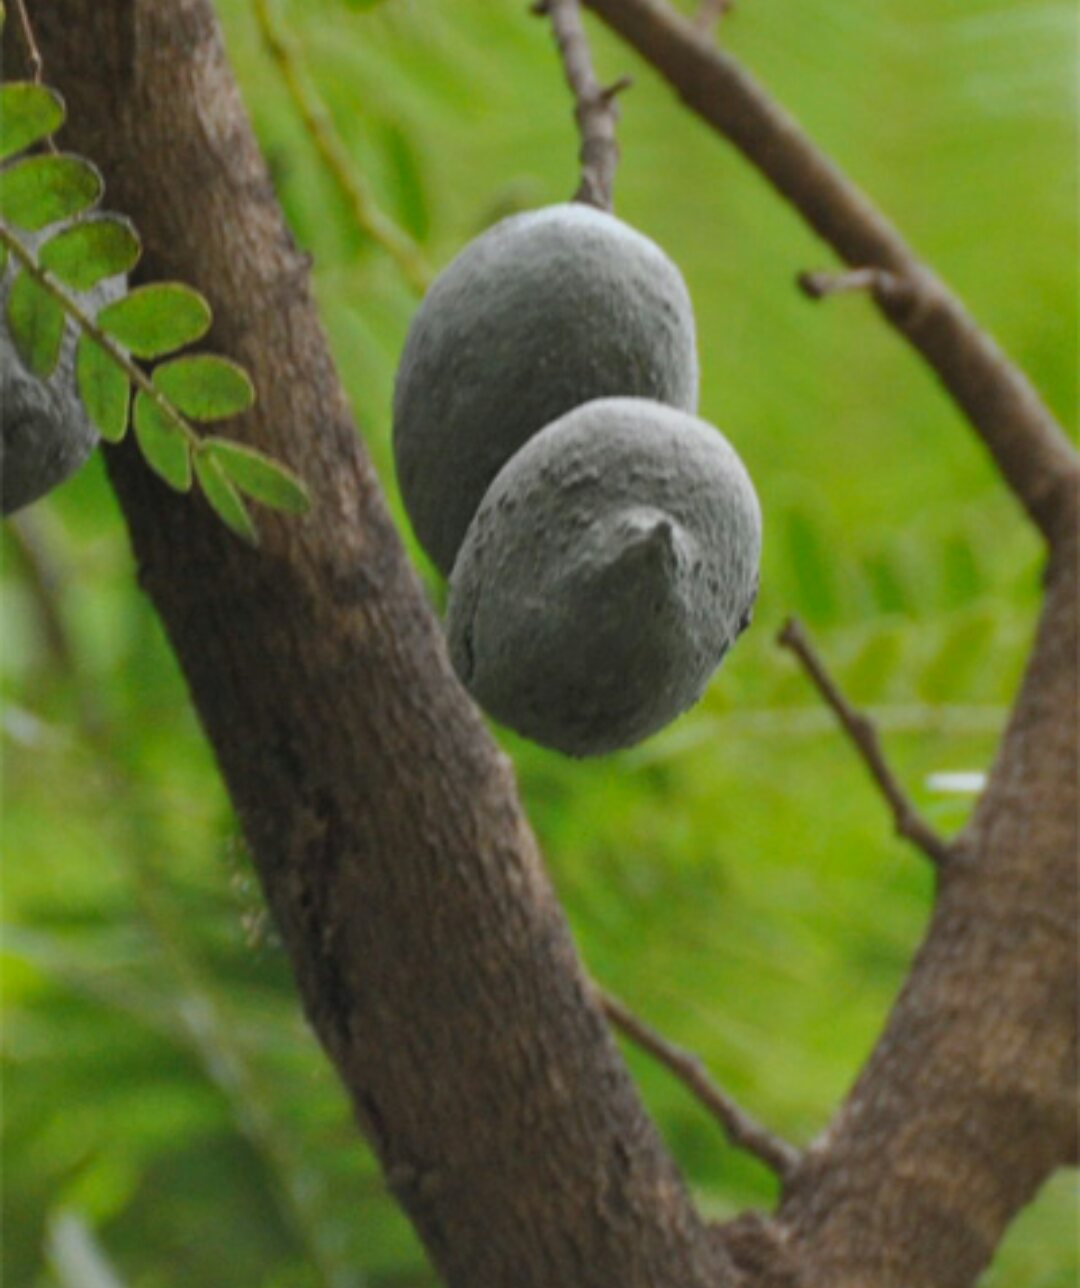 O Xrhsths عجائب النبات Sto Twitter اكيد تعرفون هذه الشجره لها ثمار منتشره في كل مكان ماهي فوائد ثمار هذه الشجره